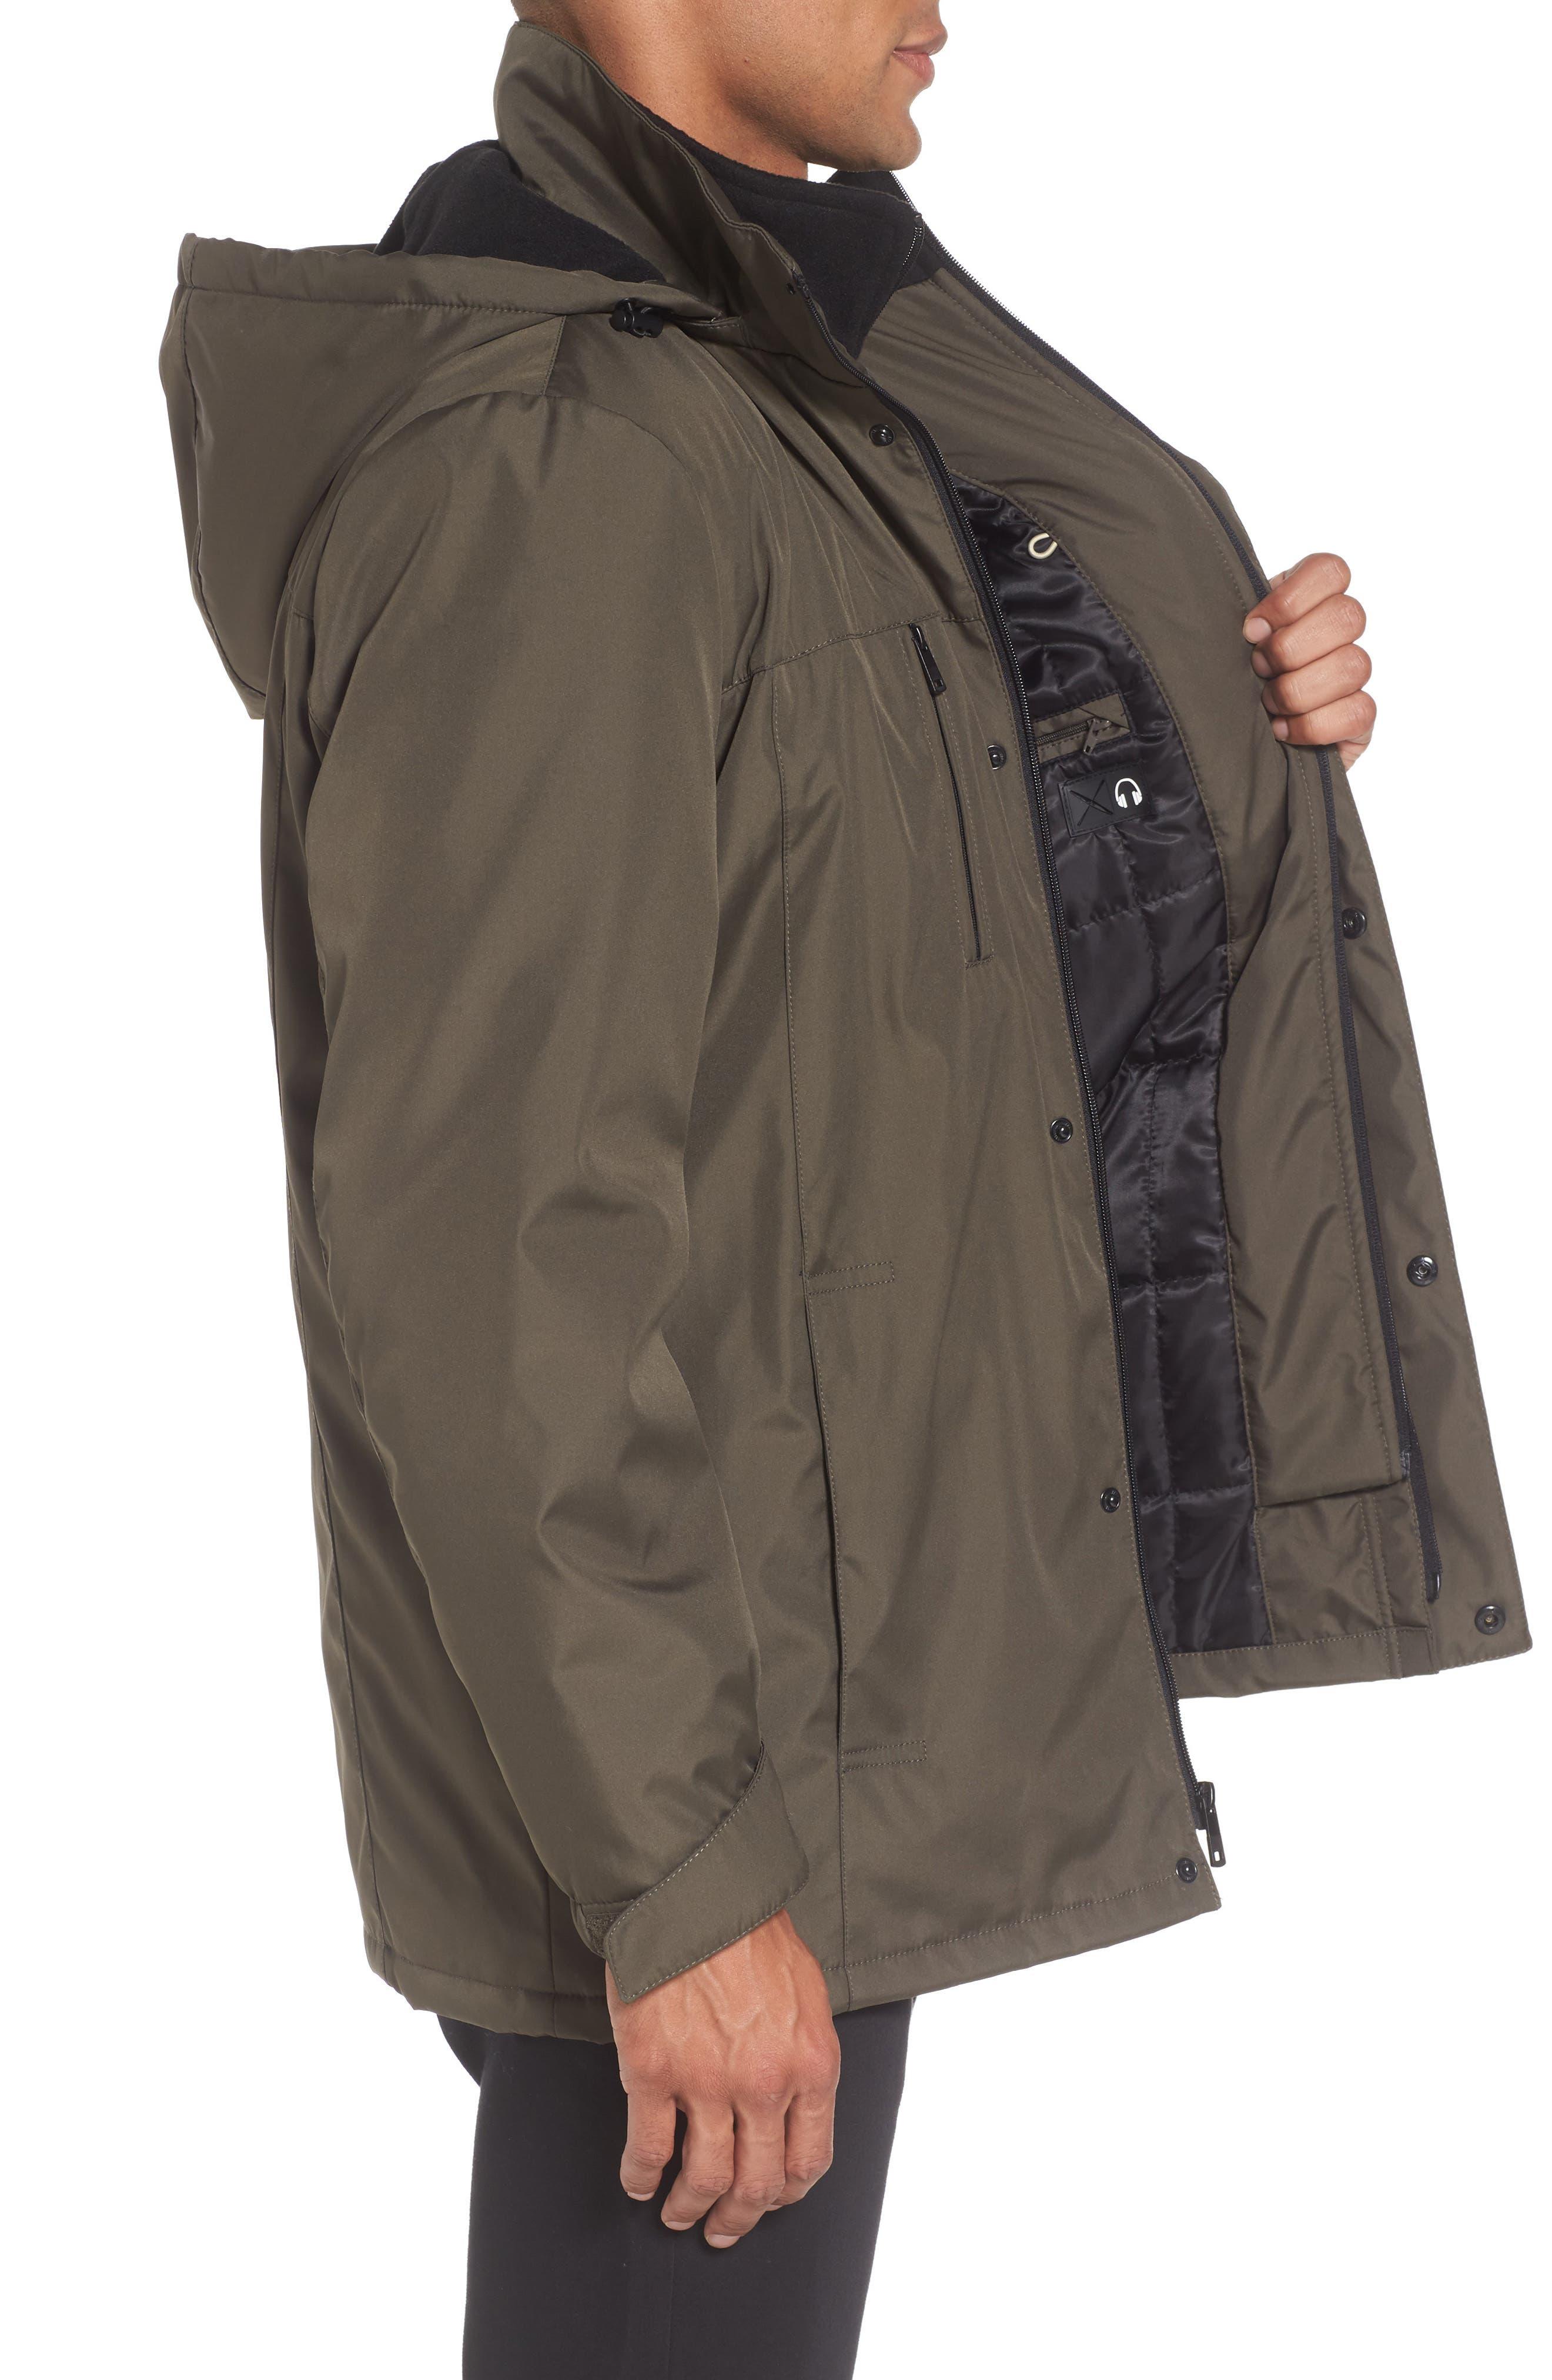 Hooded Jacket with Inset Fleece Bib,                             Alternate thumbnail 11, color,